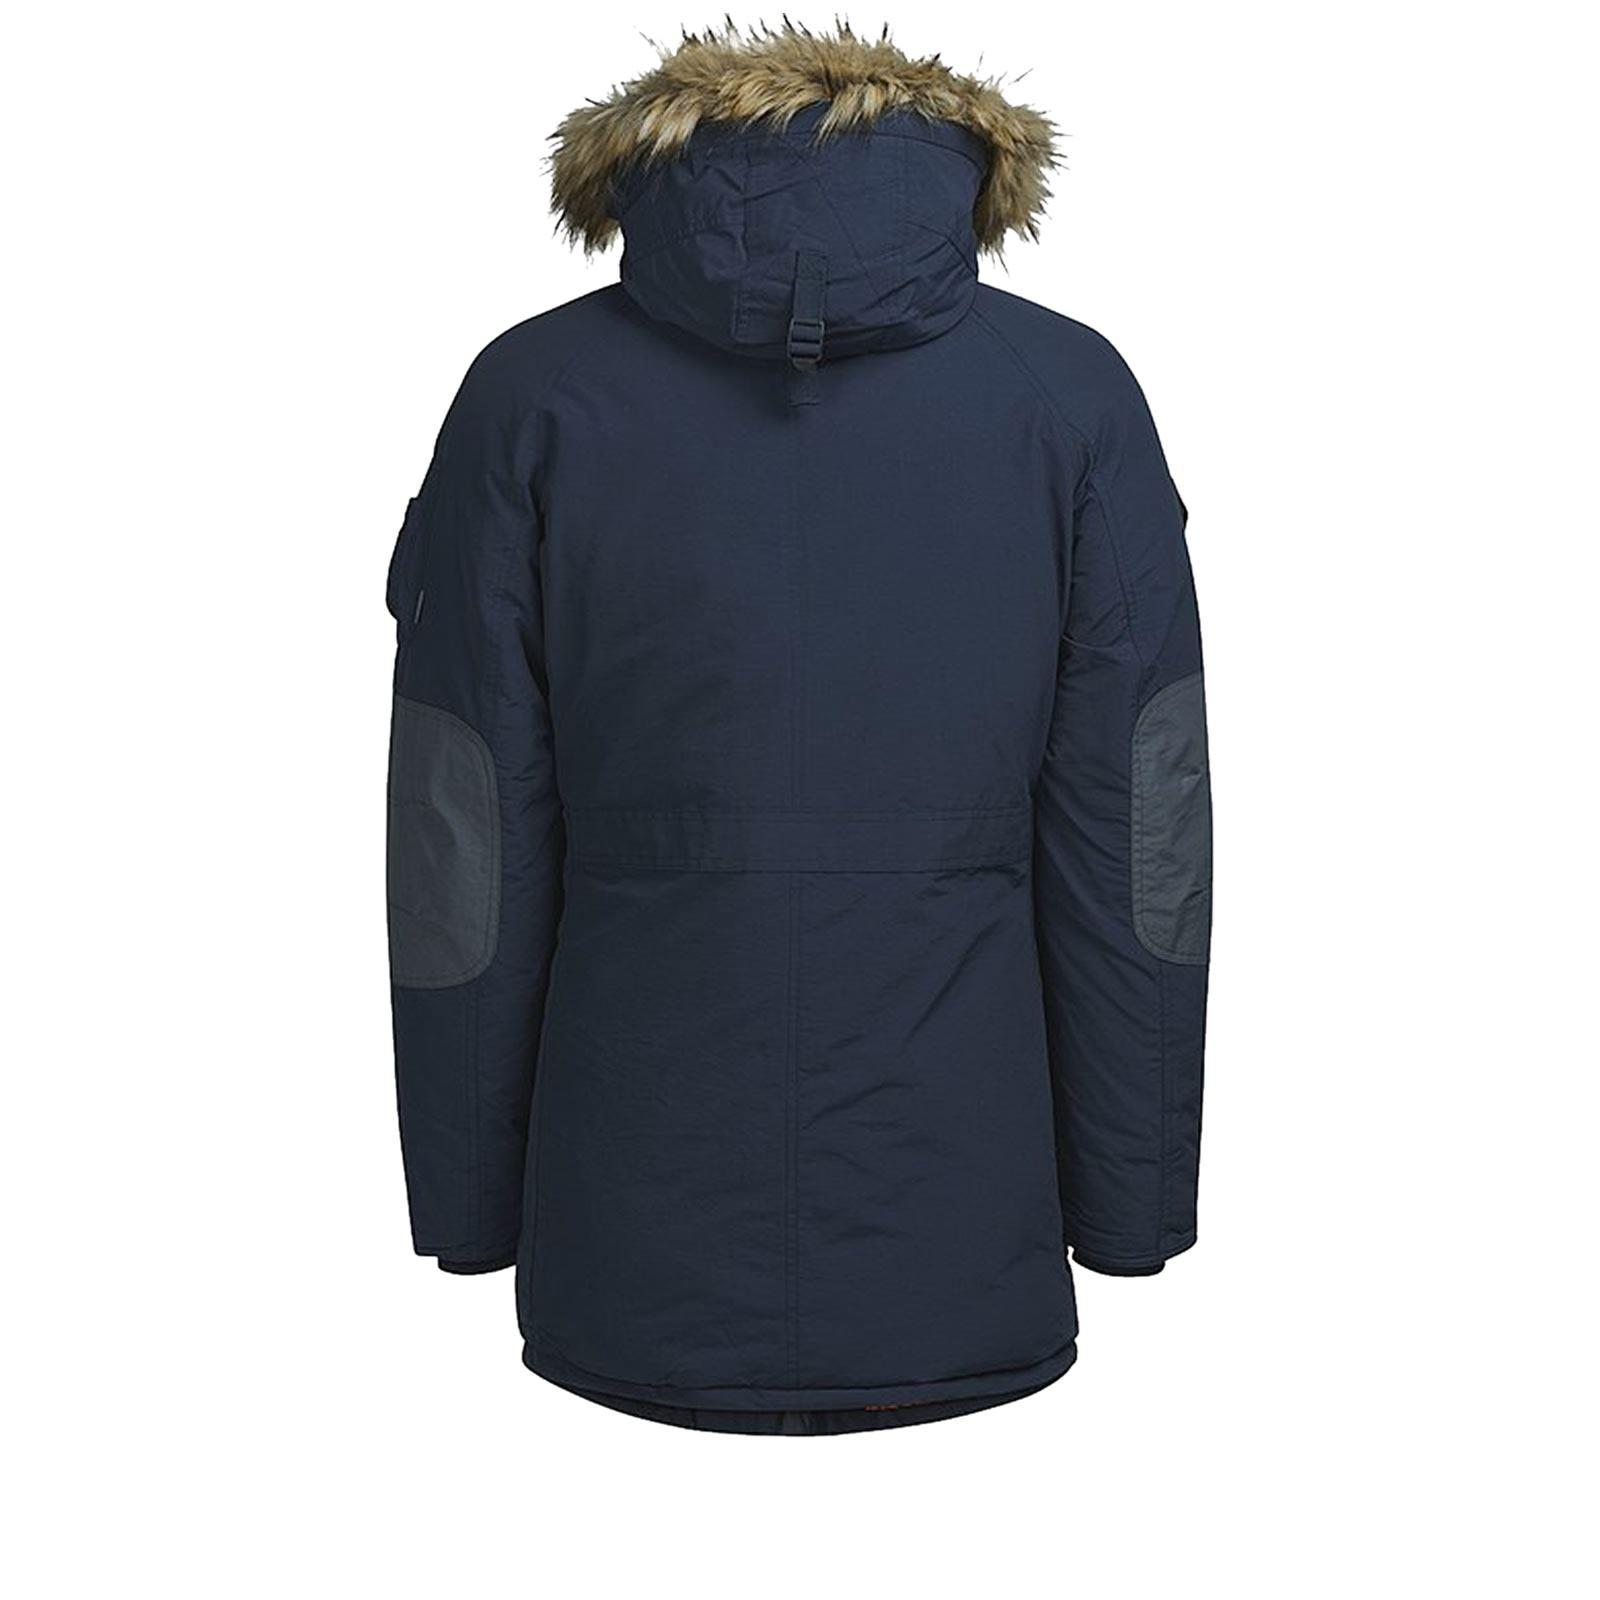 Punto sbagliato Montagna  JACK & JONES Forest Mens Parka Jacket Hooded Sherpa Linned Zip Up Coat |  eBay